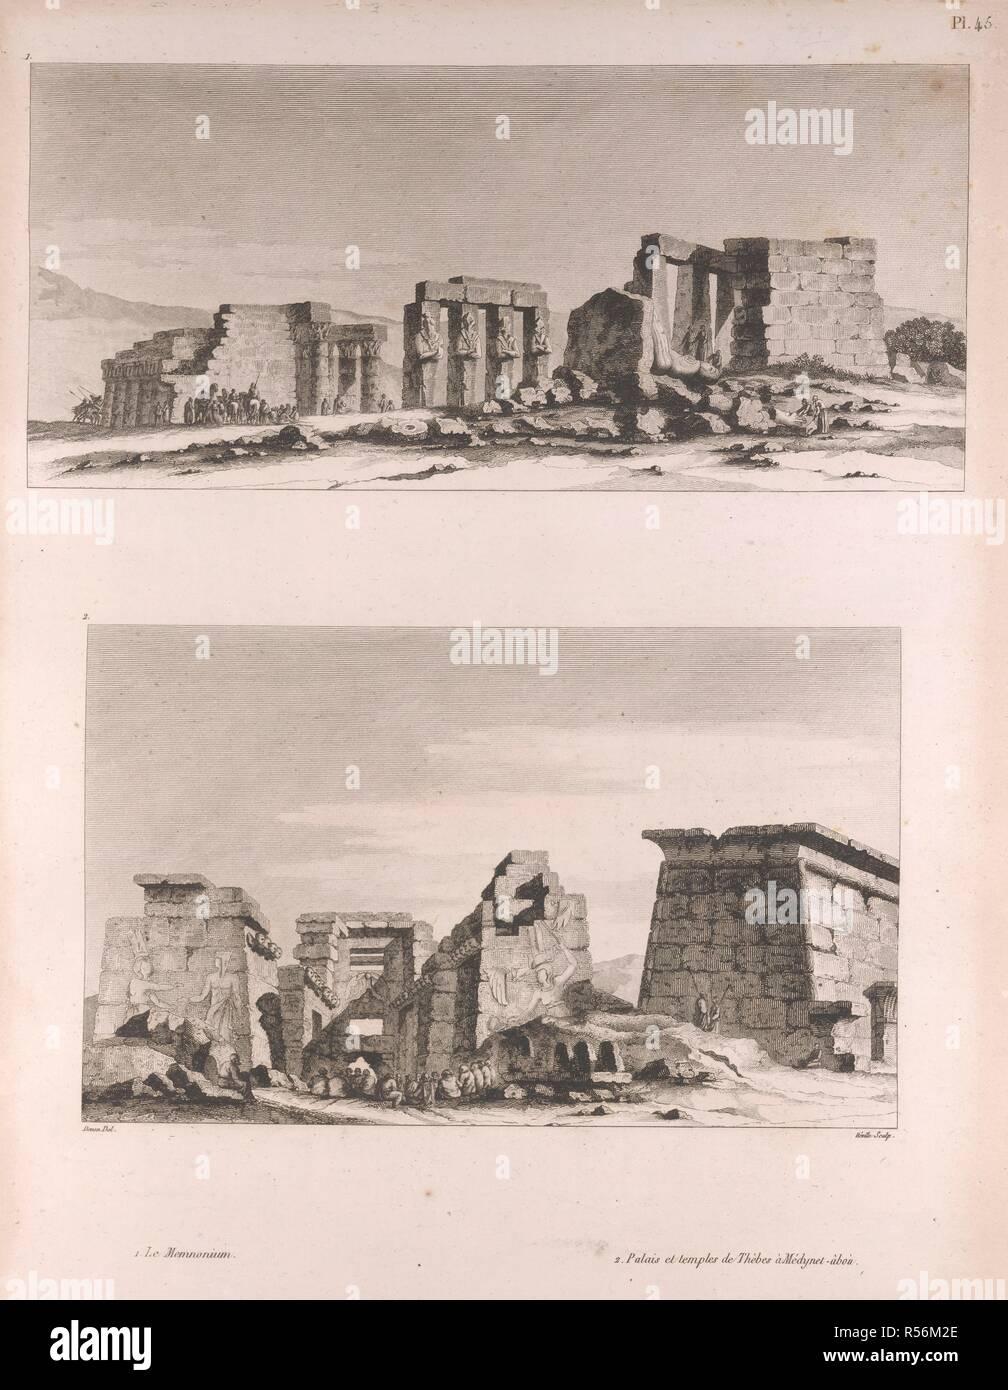 Egyptian Ancient Language Stock Photos & Egyptian Ancient